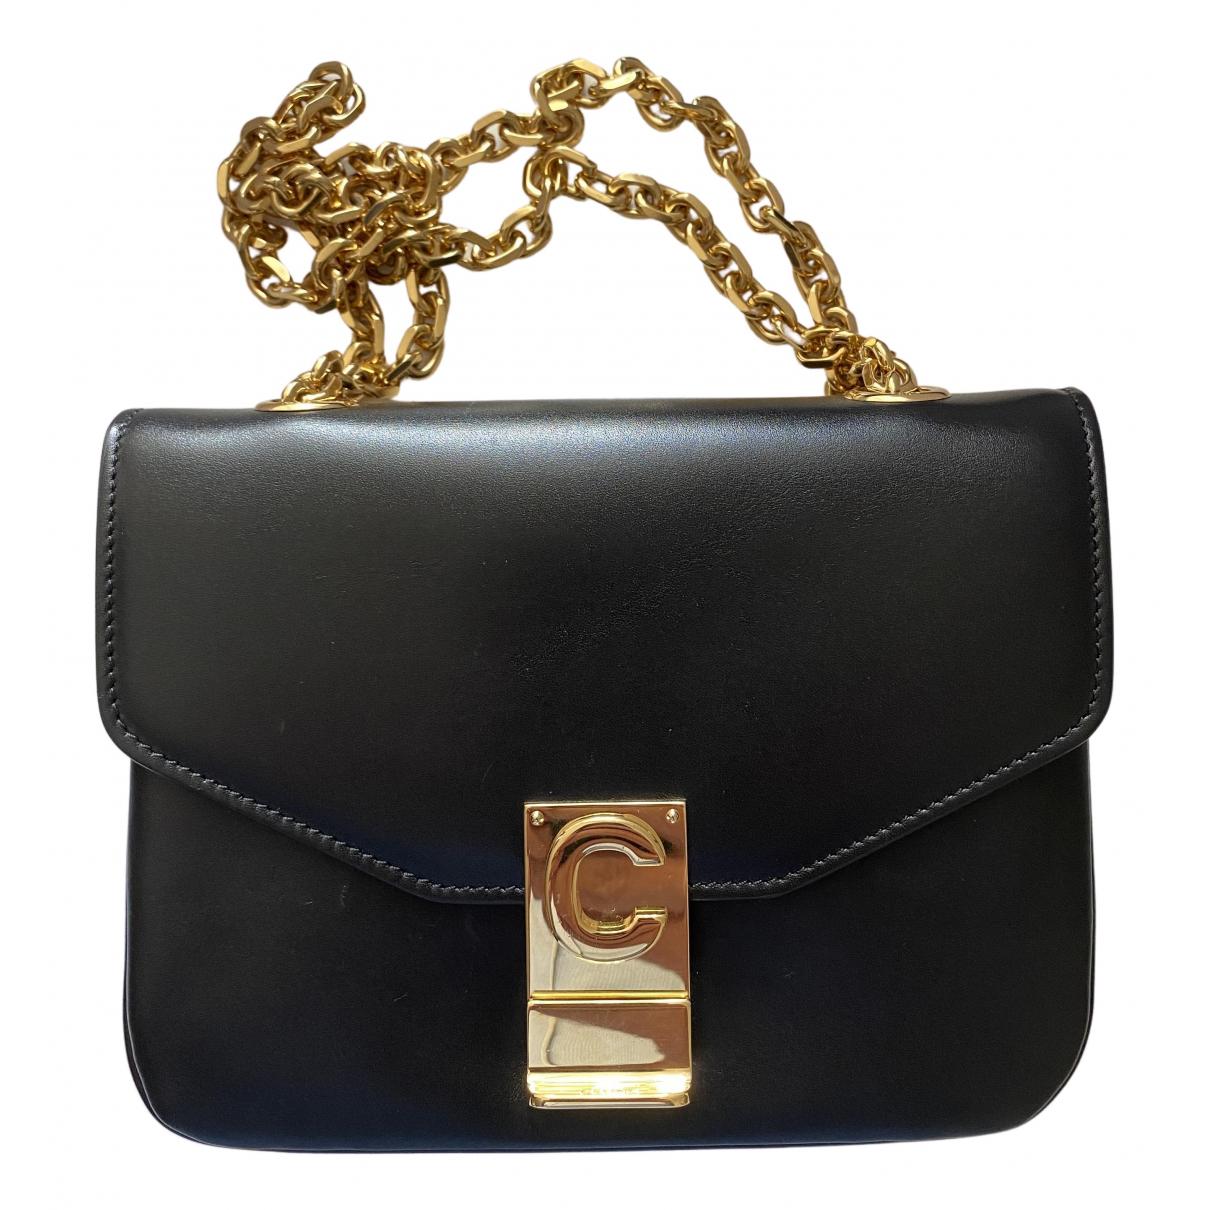 Celine C bag Black Leather handbag for Women N